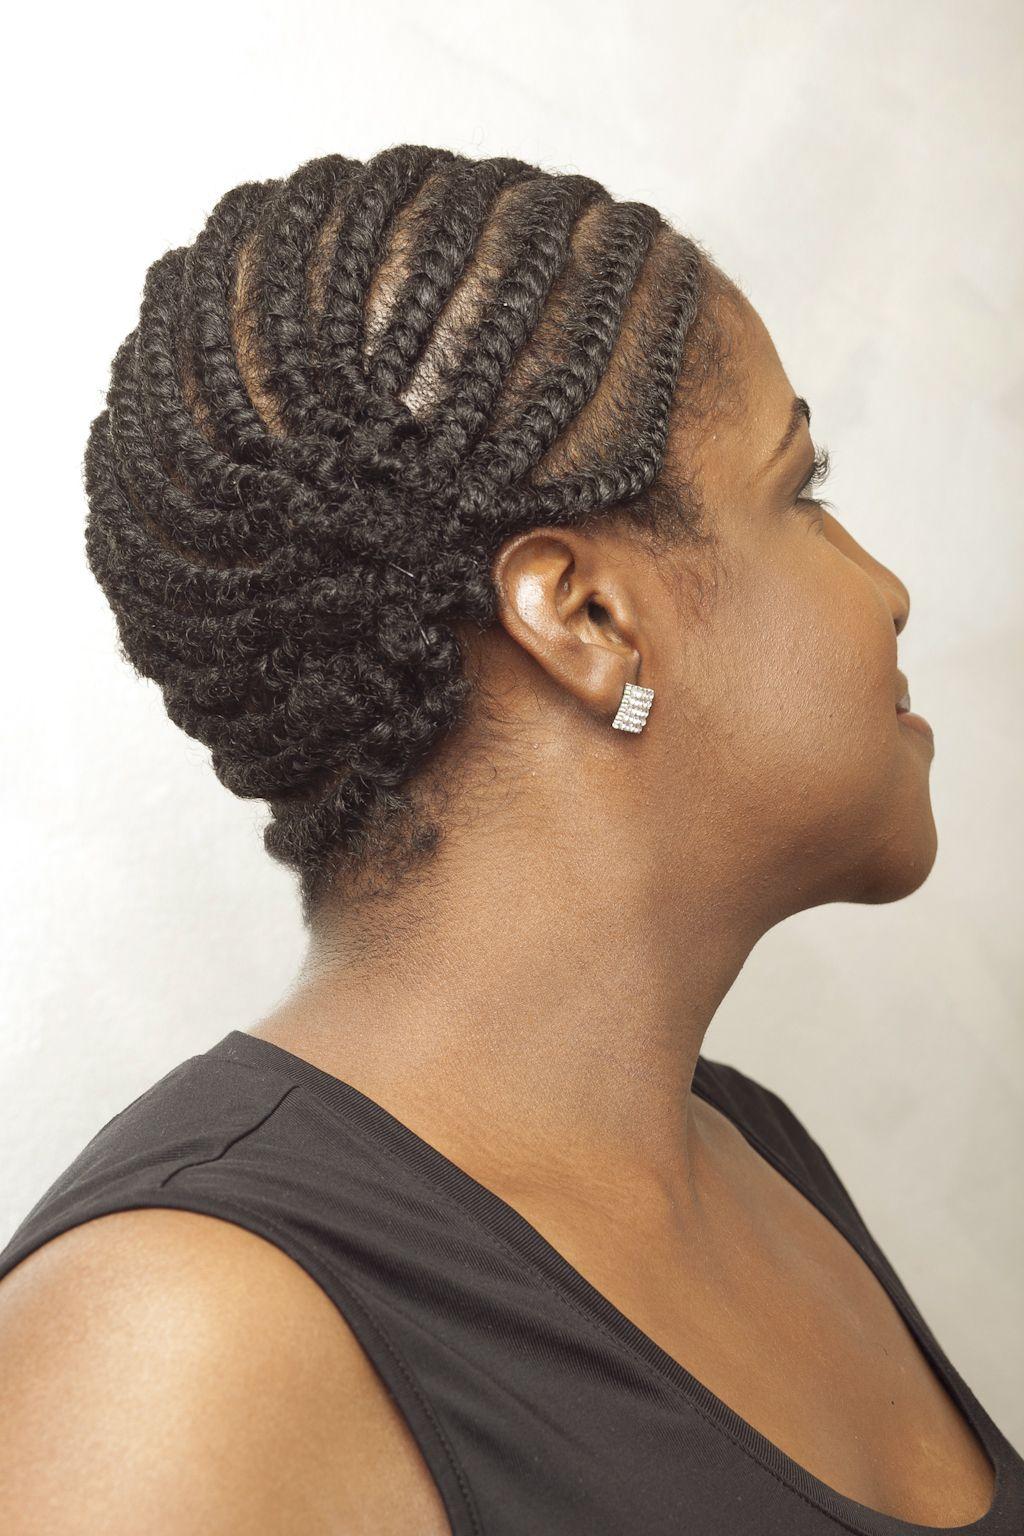 natural updo hairstyles   Bing images   Natural hair updo ...